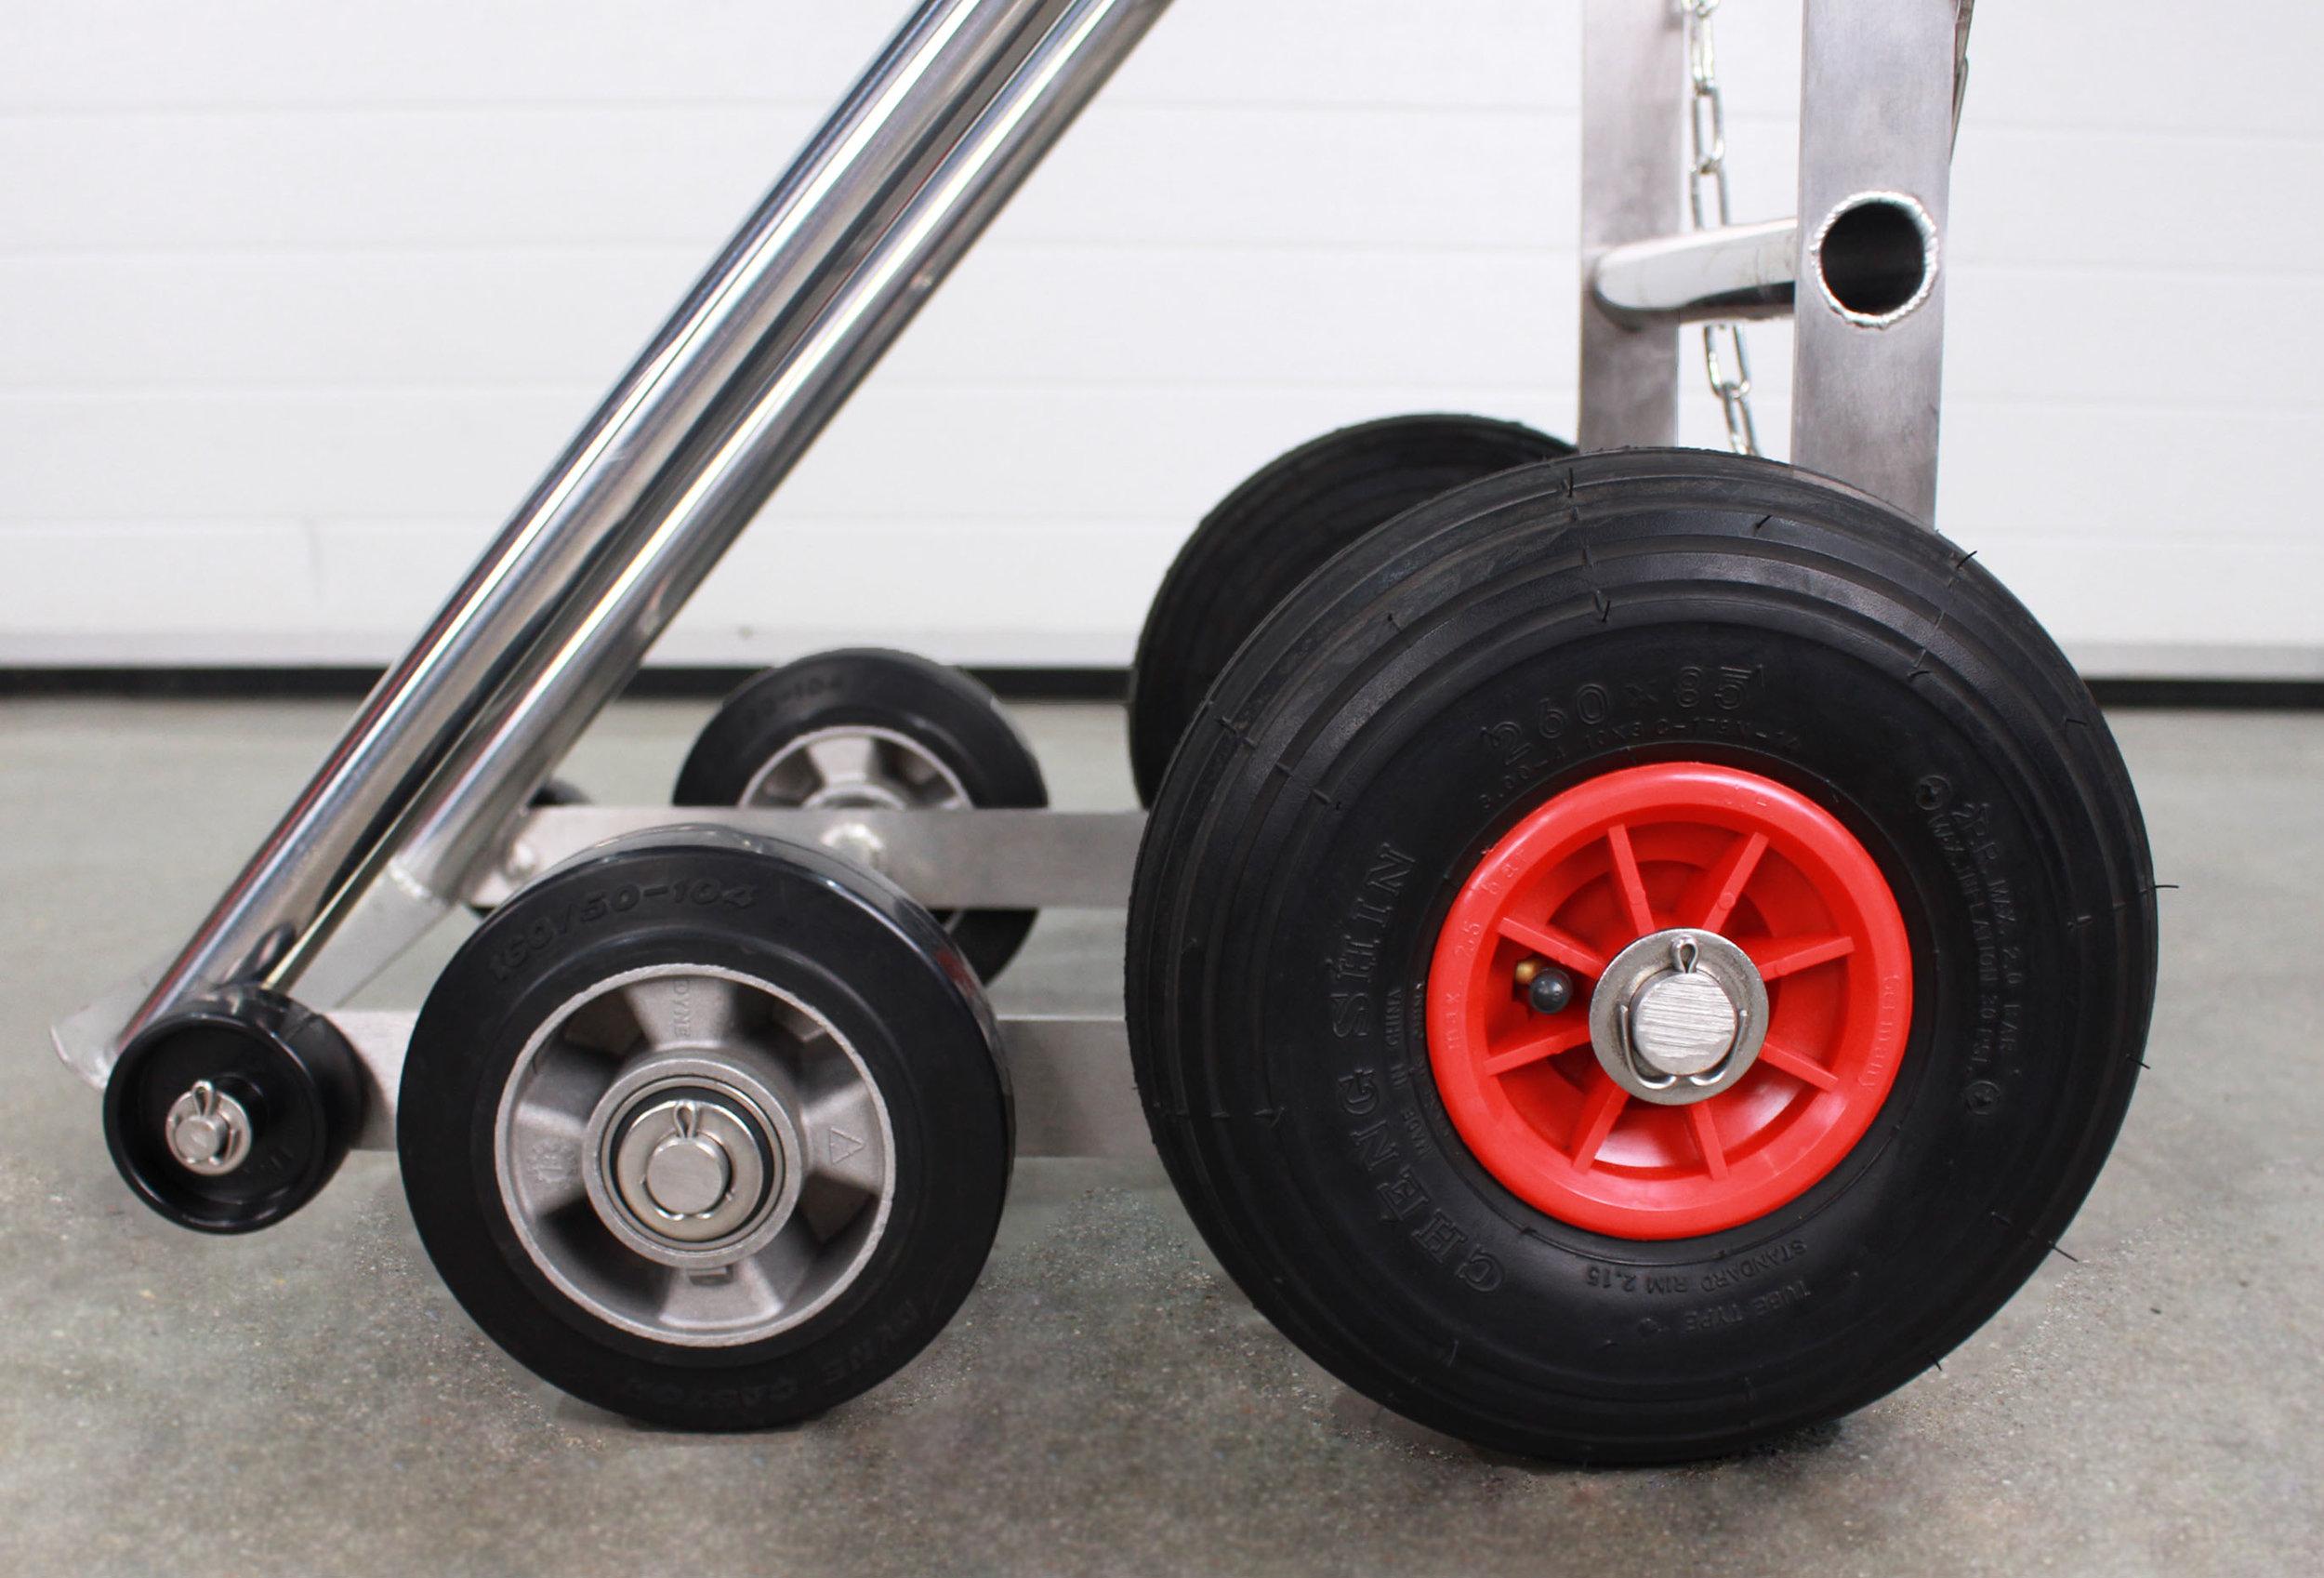 LPG-gas-trolleys-unique-wheels.jpg